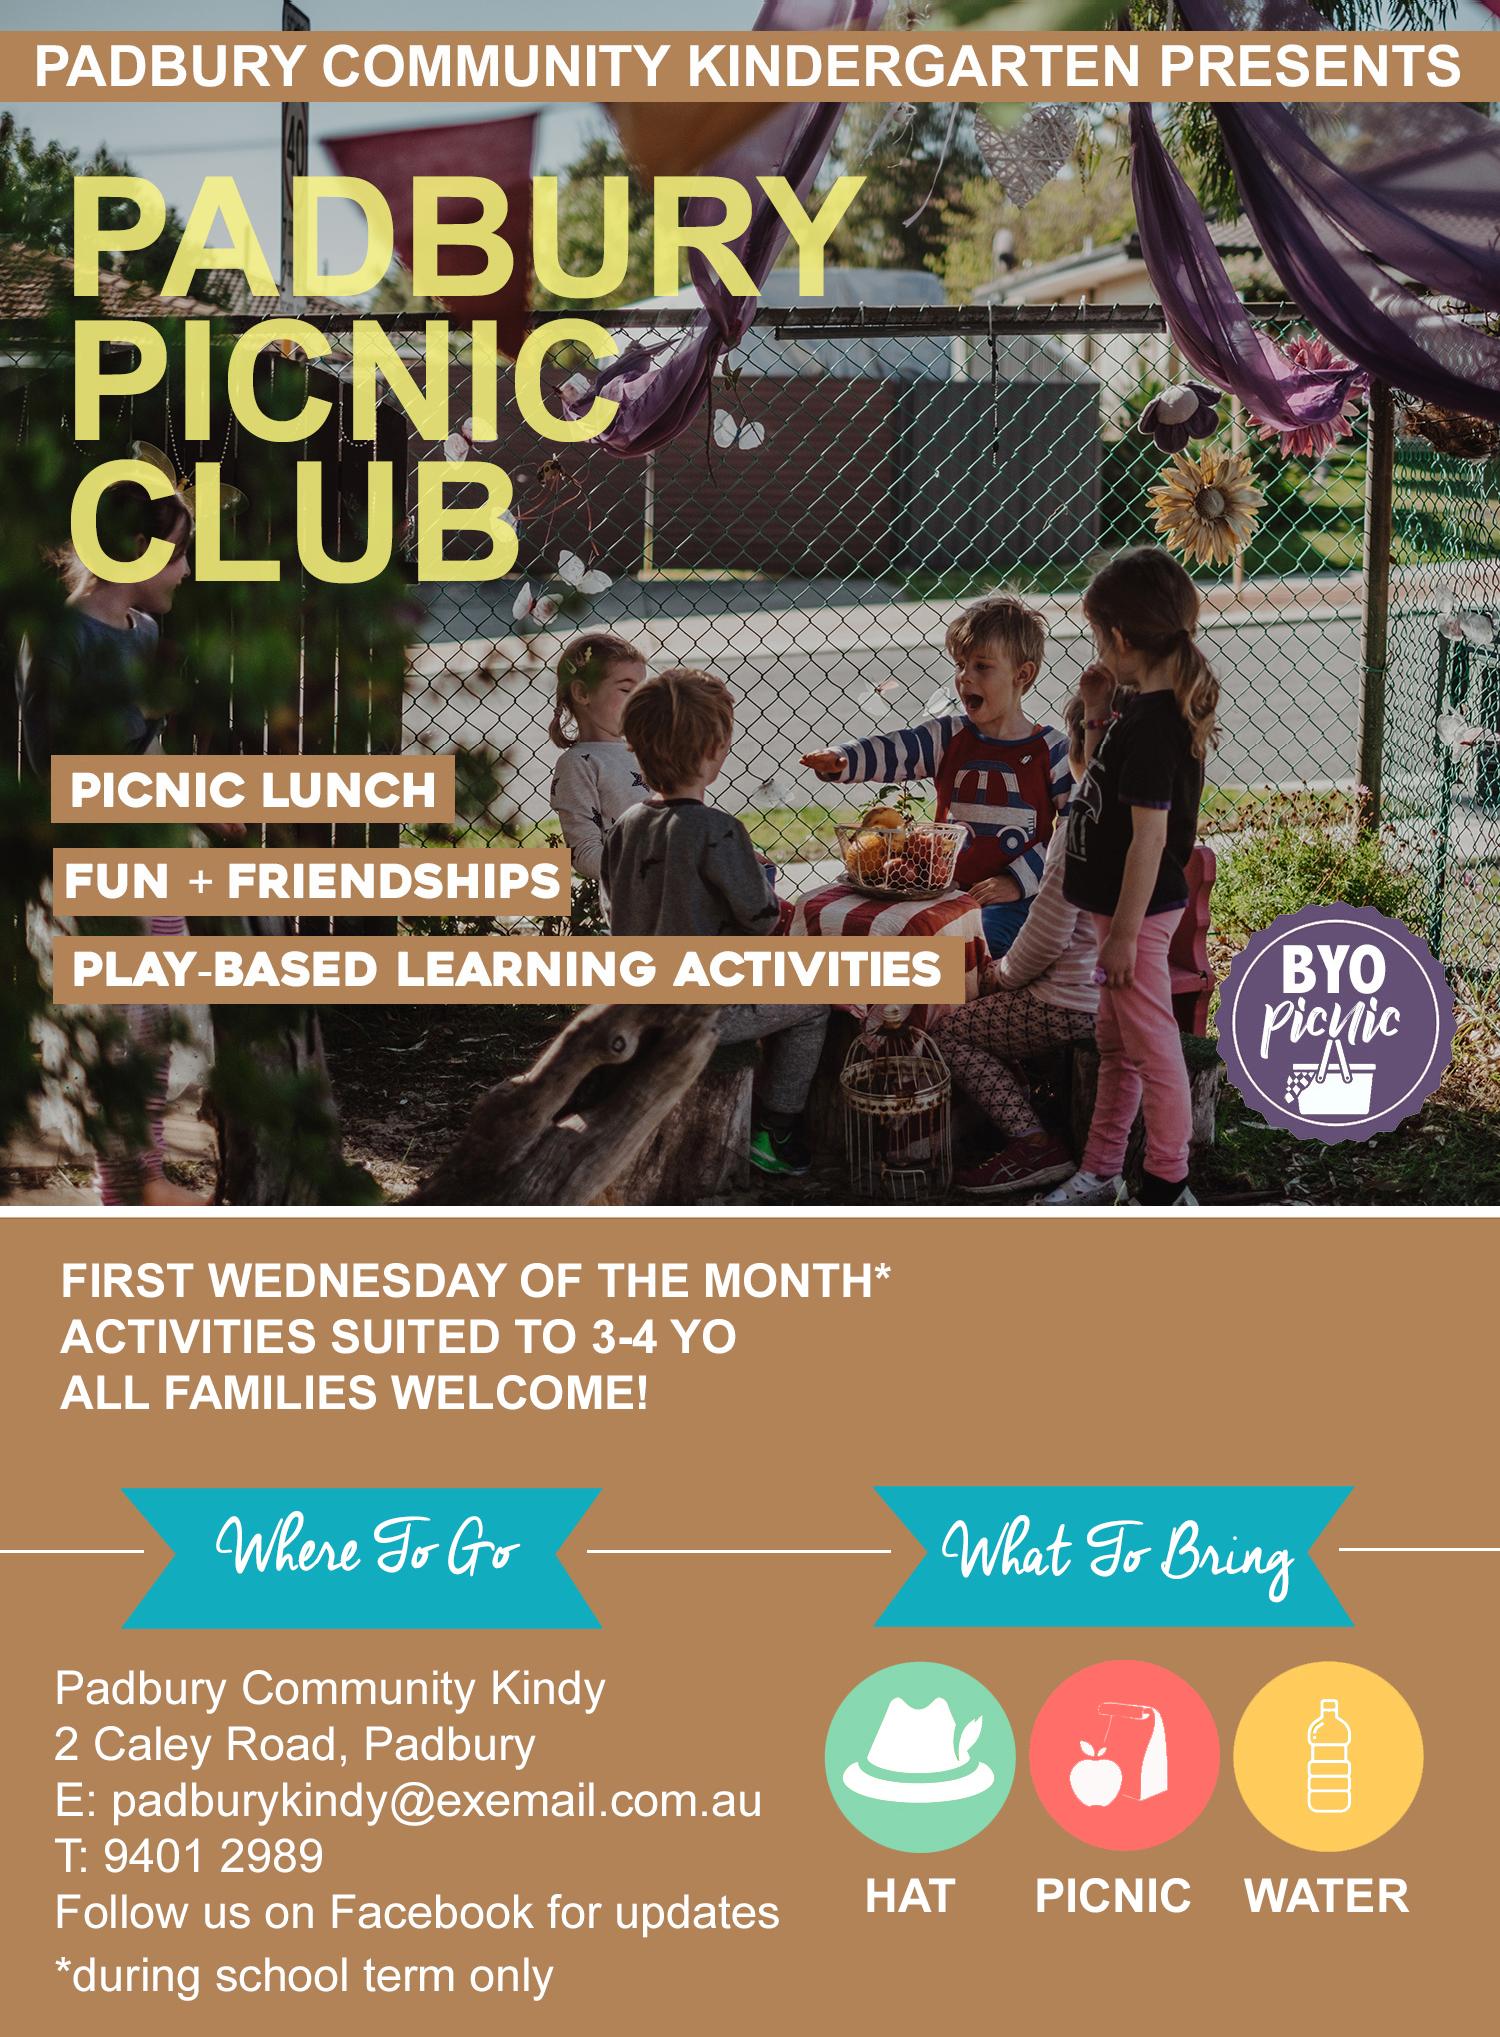 Padbury Picnic Club